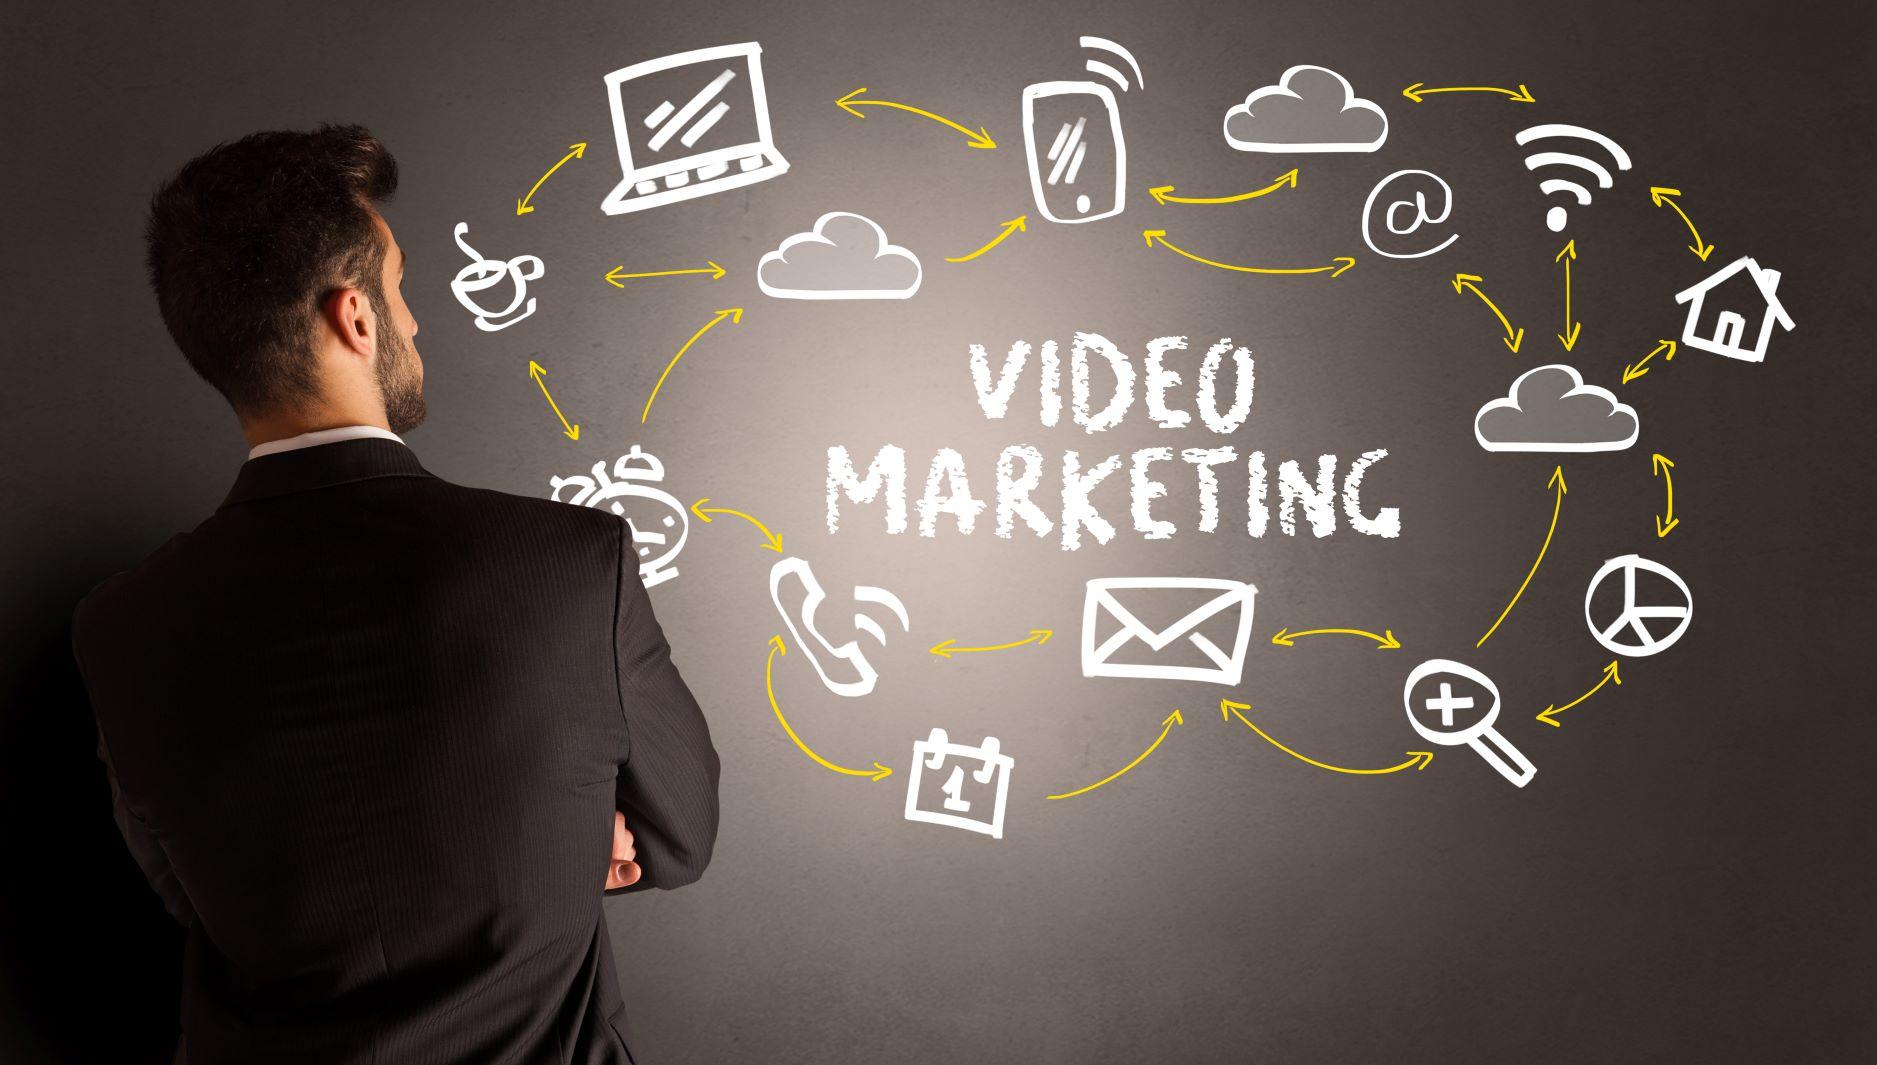 Cinema8 Blog - 15 Different Types of Video Marketing